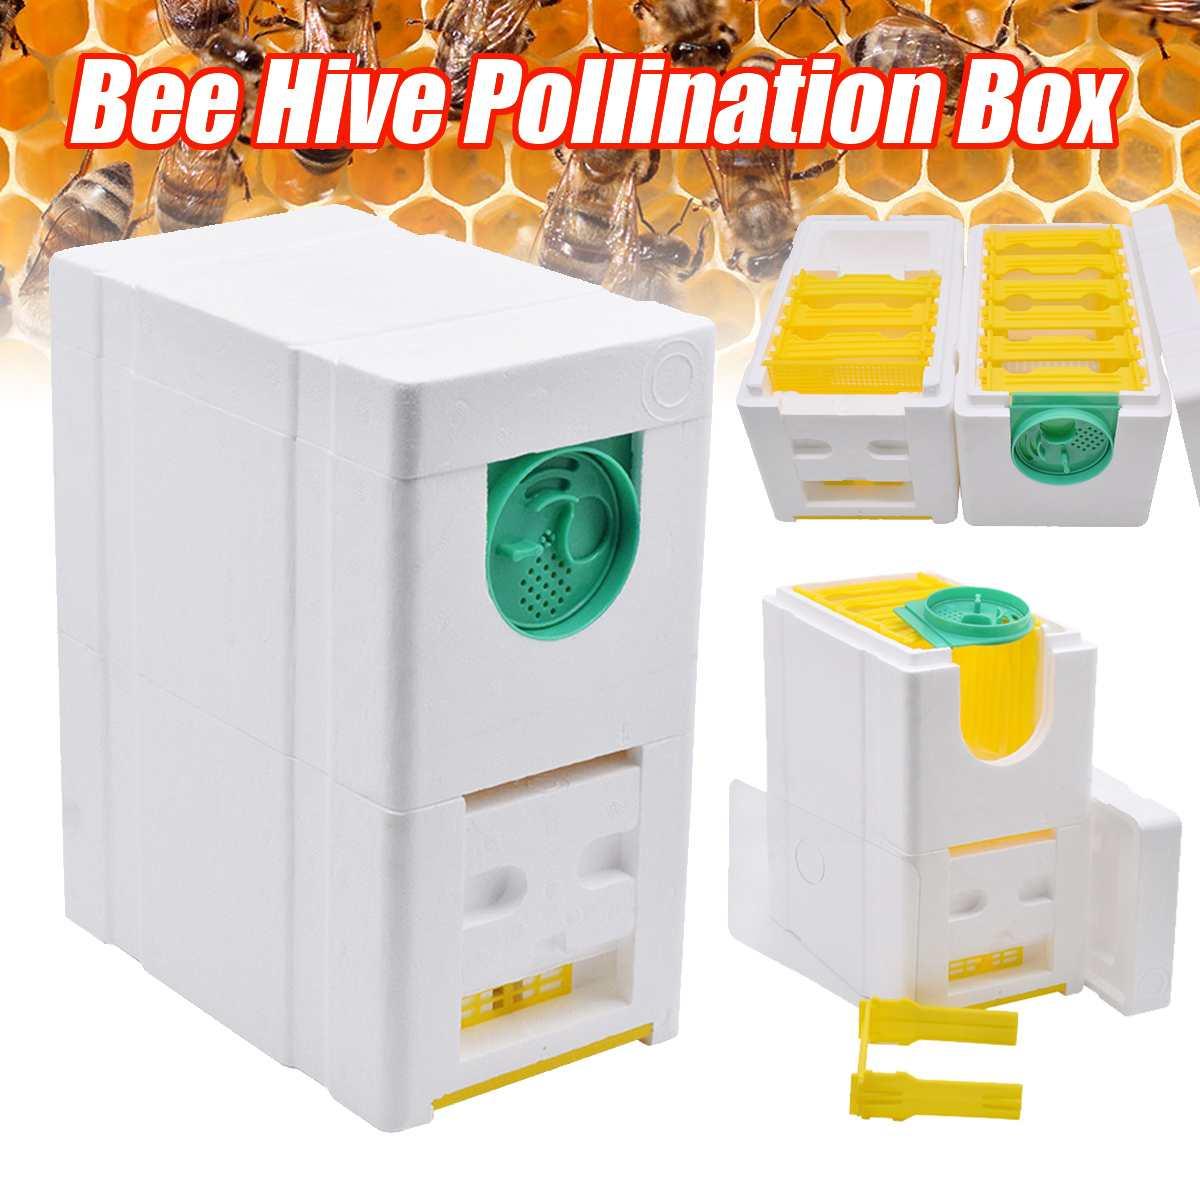 Honey Beehive Frames Beekeeping Box Bee Hive King Pollination Box Bee Mating Copulation Box Beekeeping Equipment